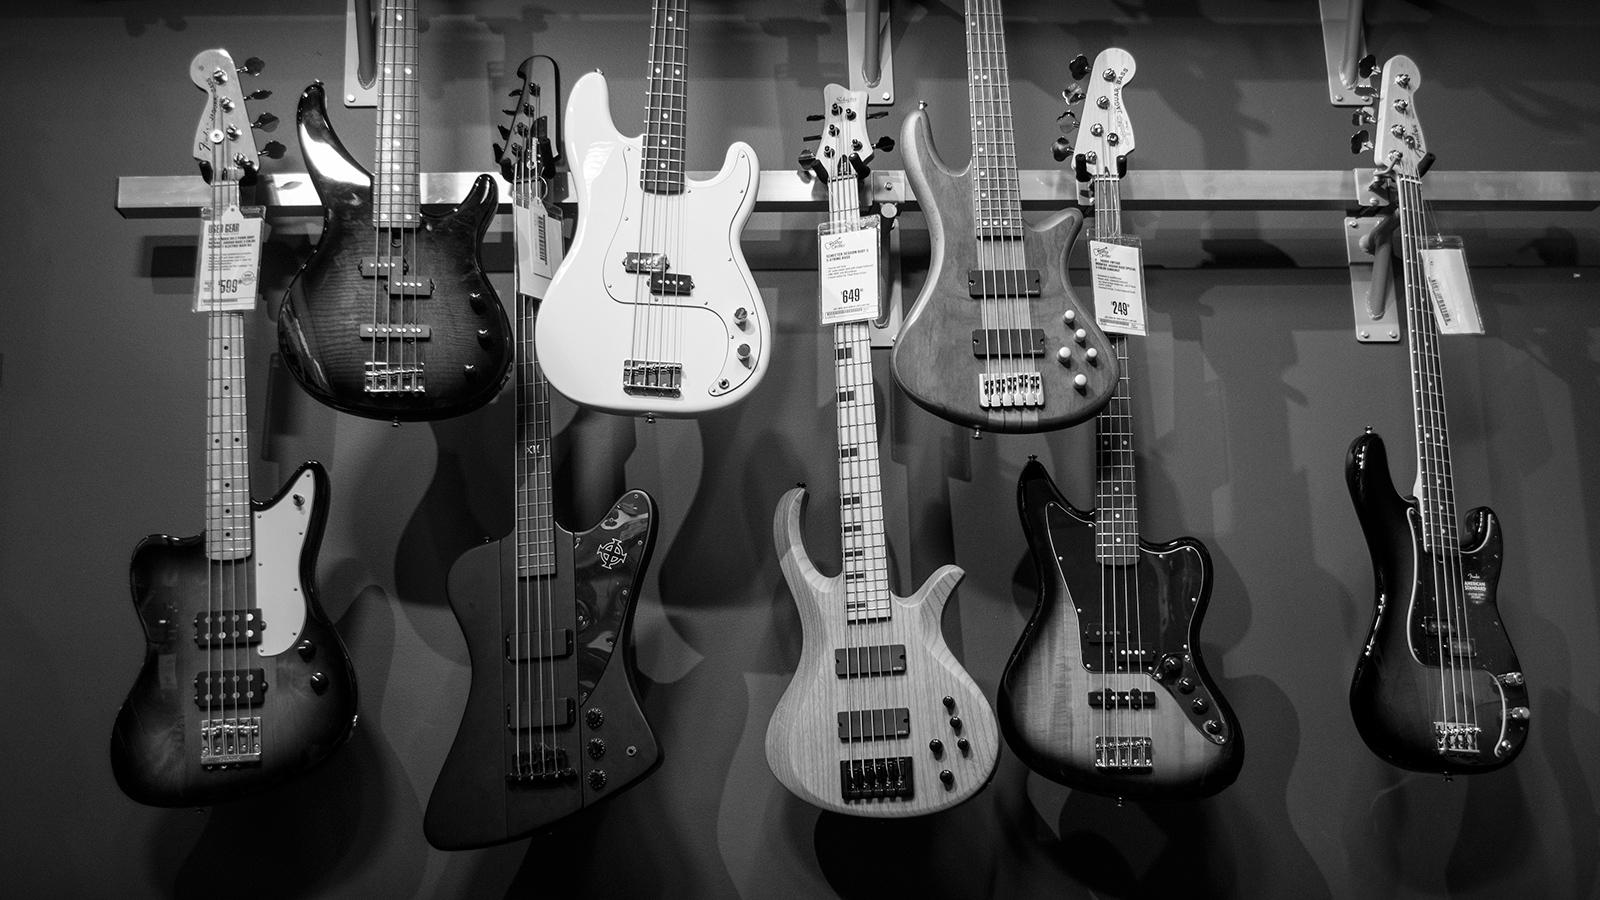 music-guitar-classic